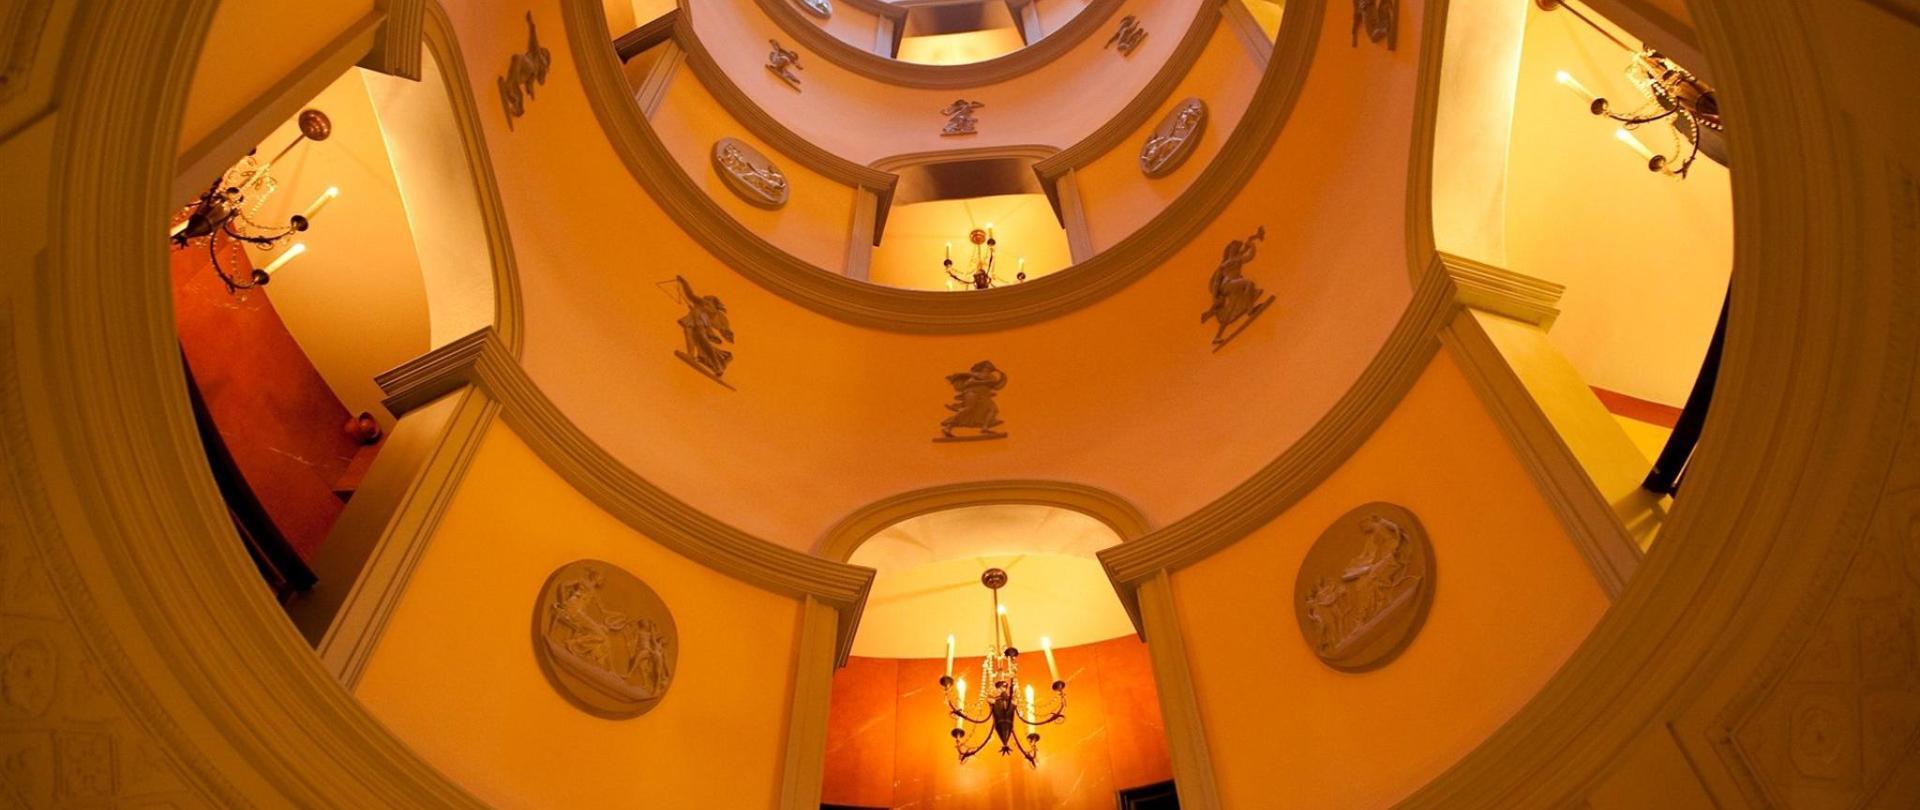 The Circular Hall L'Hotel.jpg